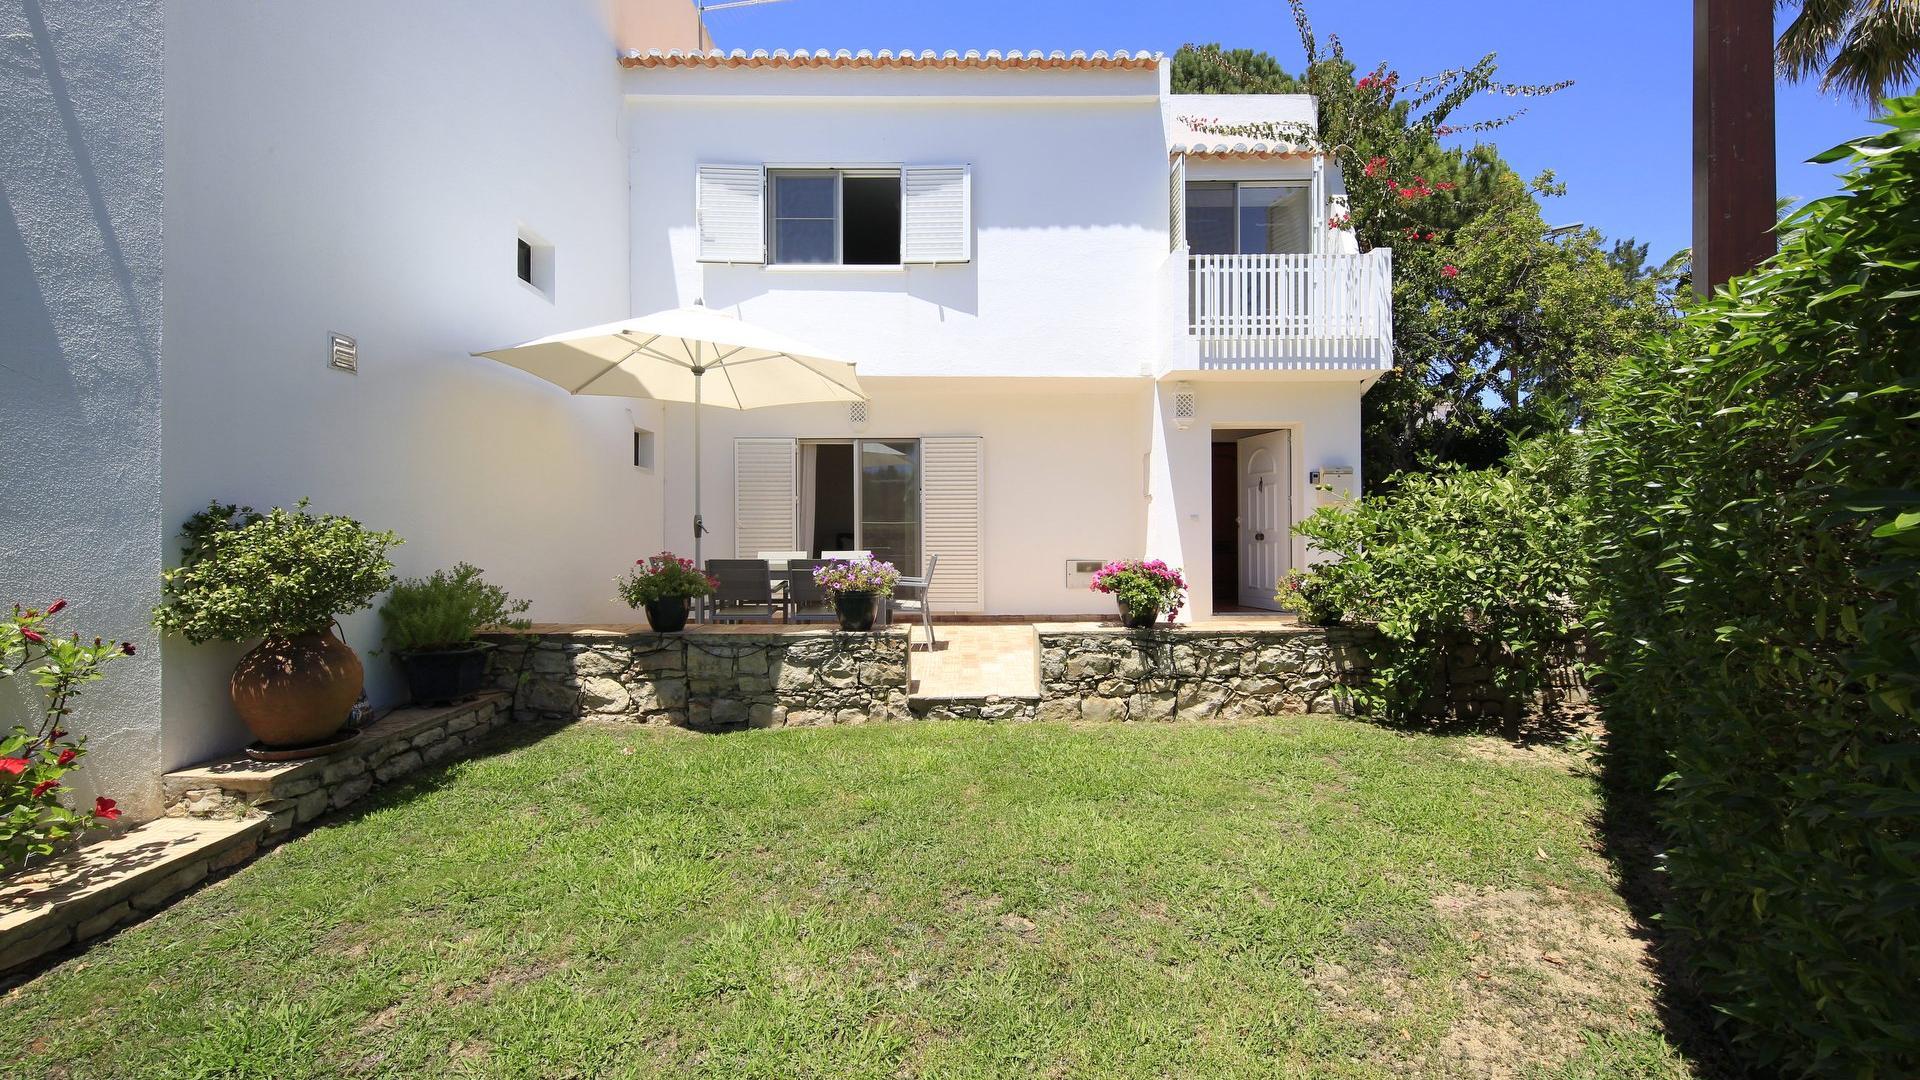 Casa Malika - Vale do Lobo, Algarve - Casa_Malika_Exterior_1.jpg